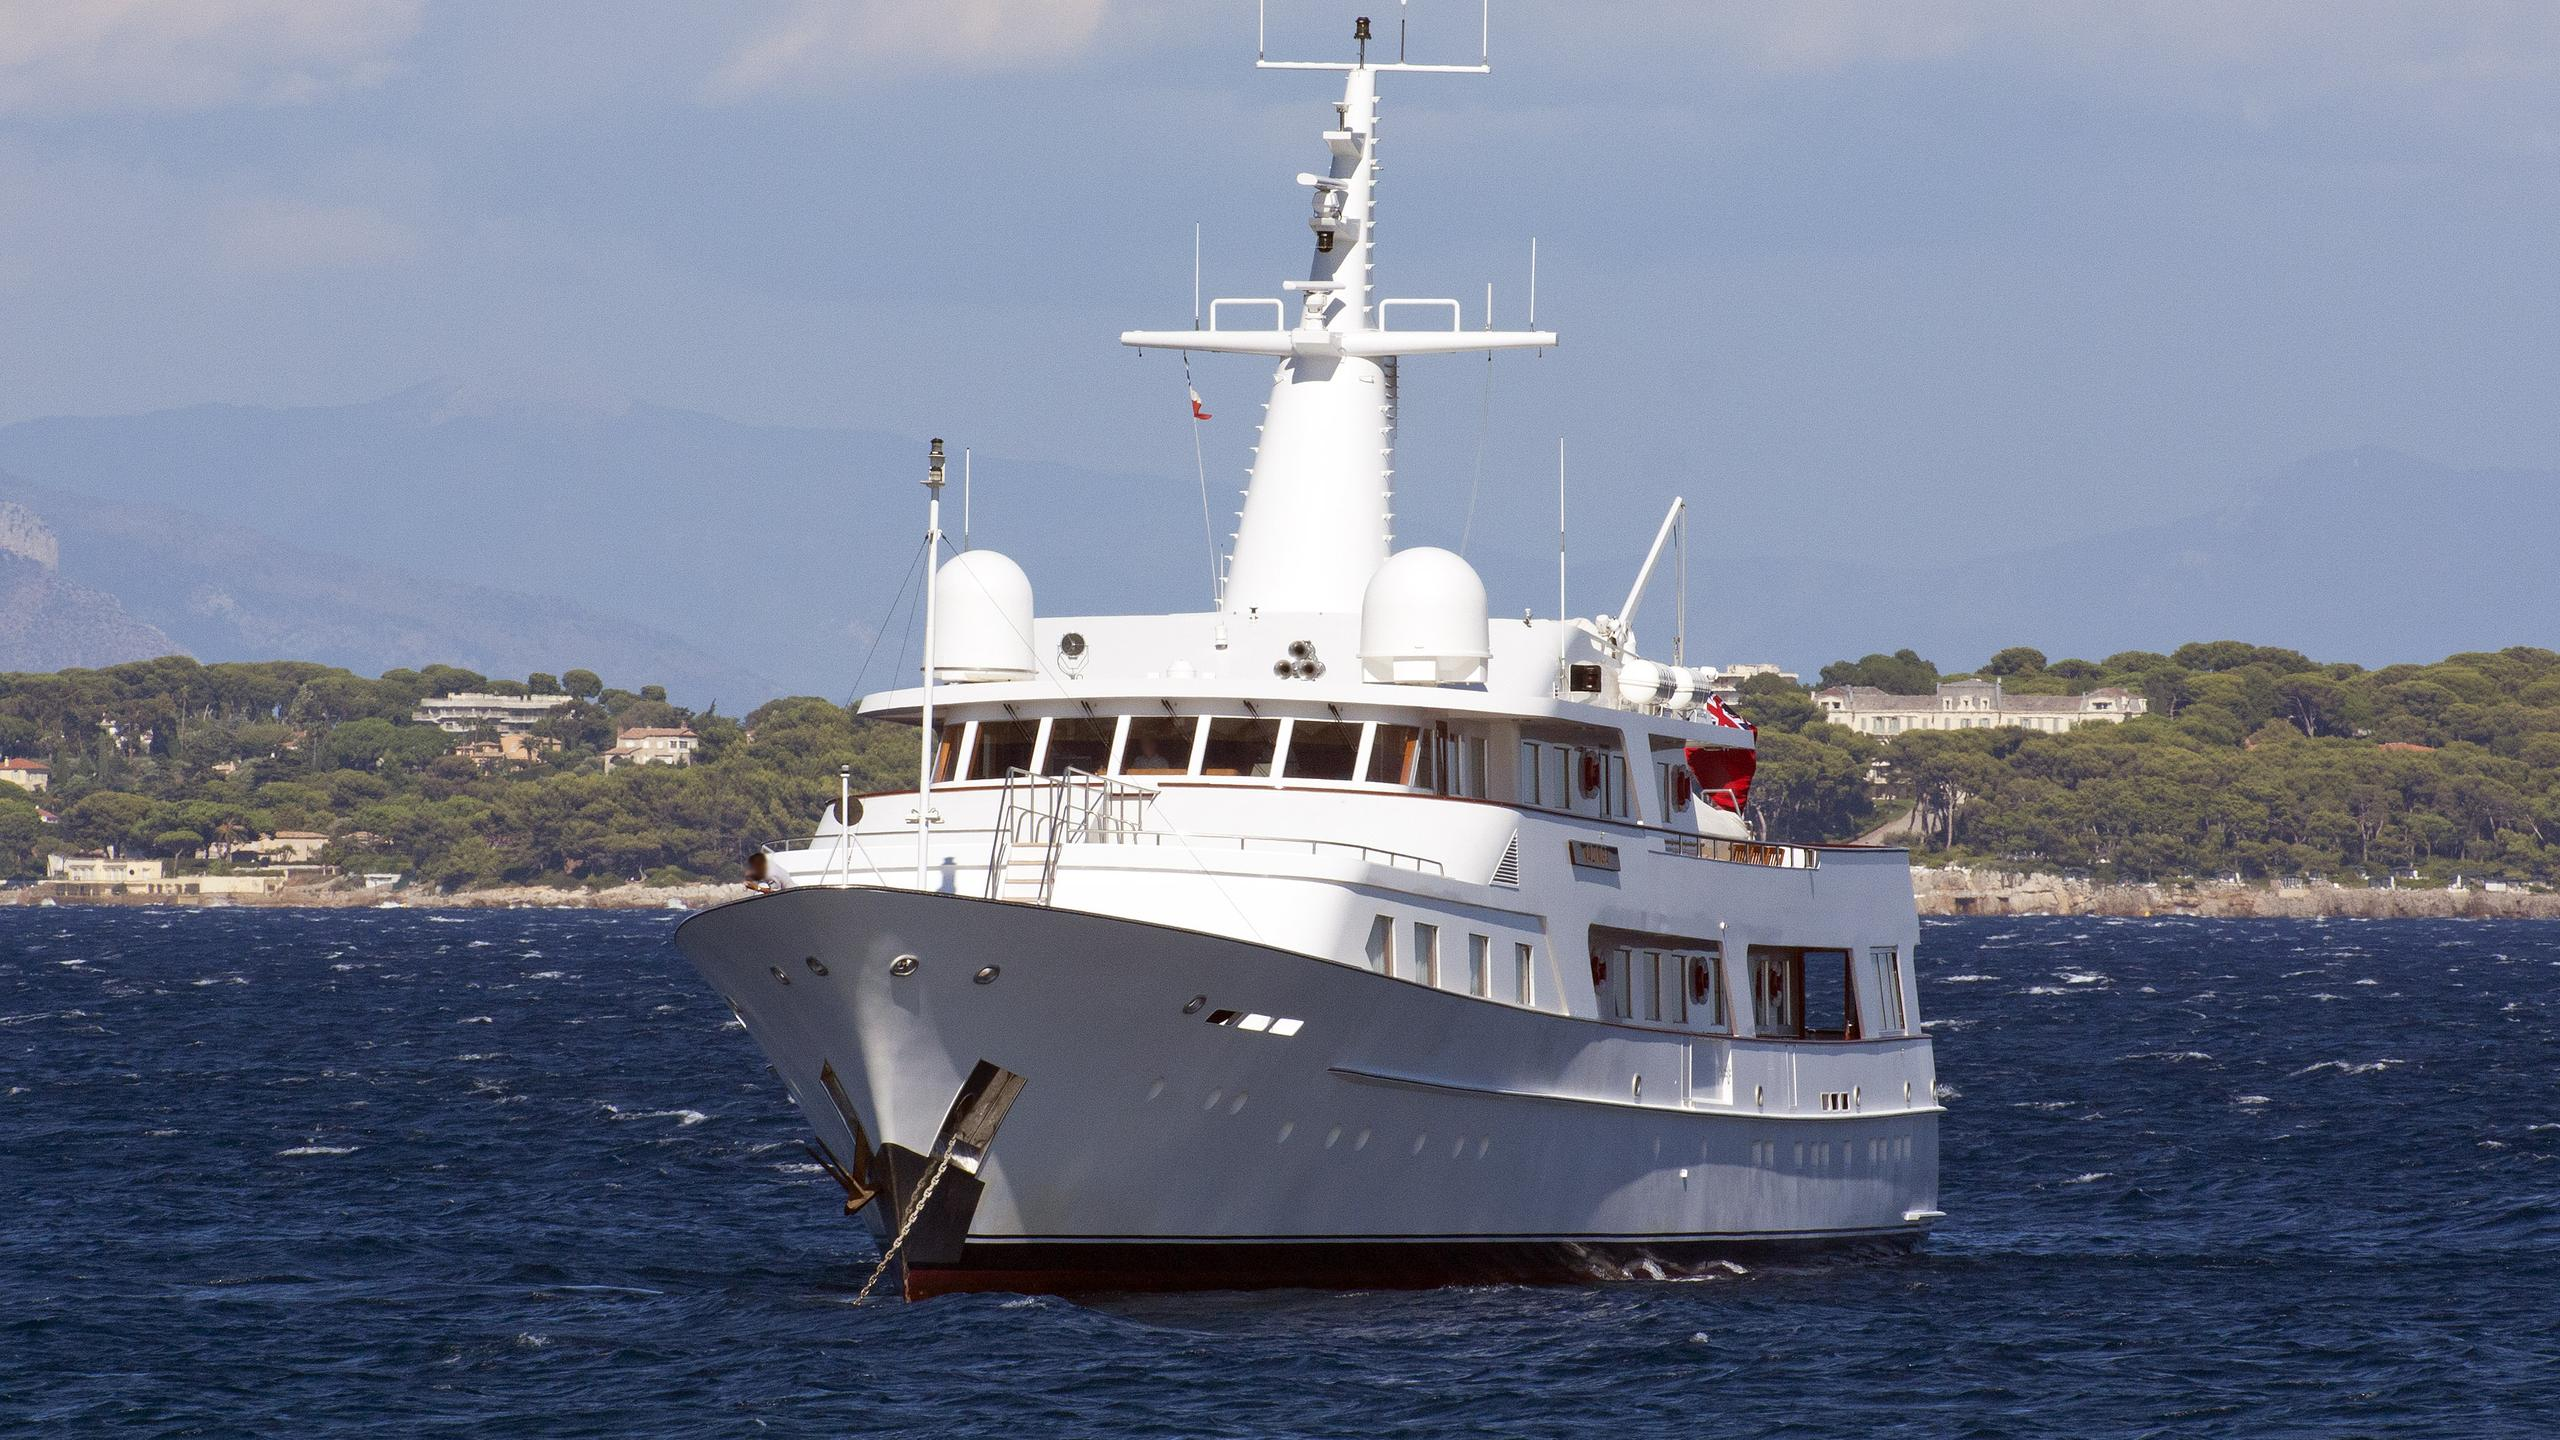 kalinga-motor-yacht-feadship-1982-54m-bow